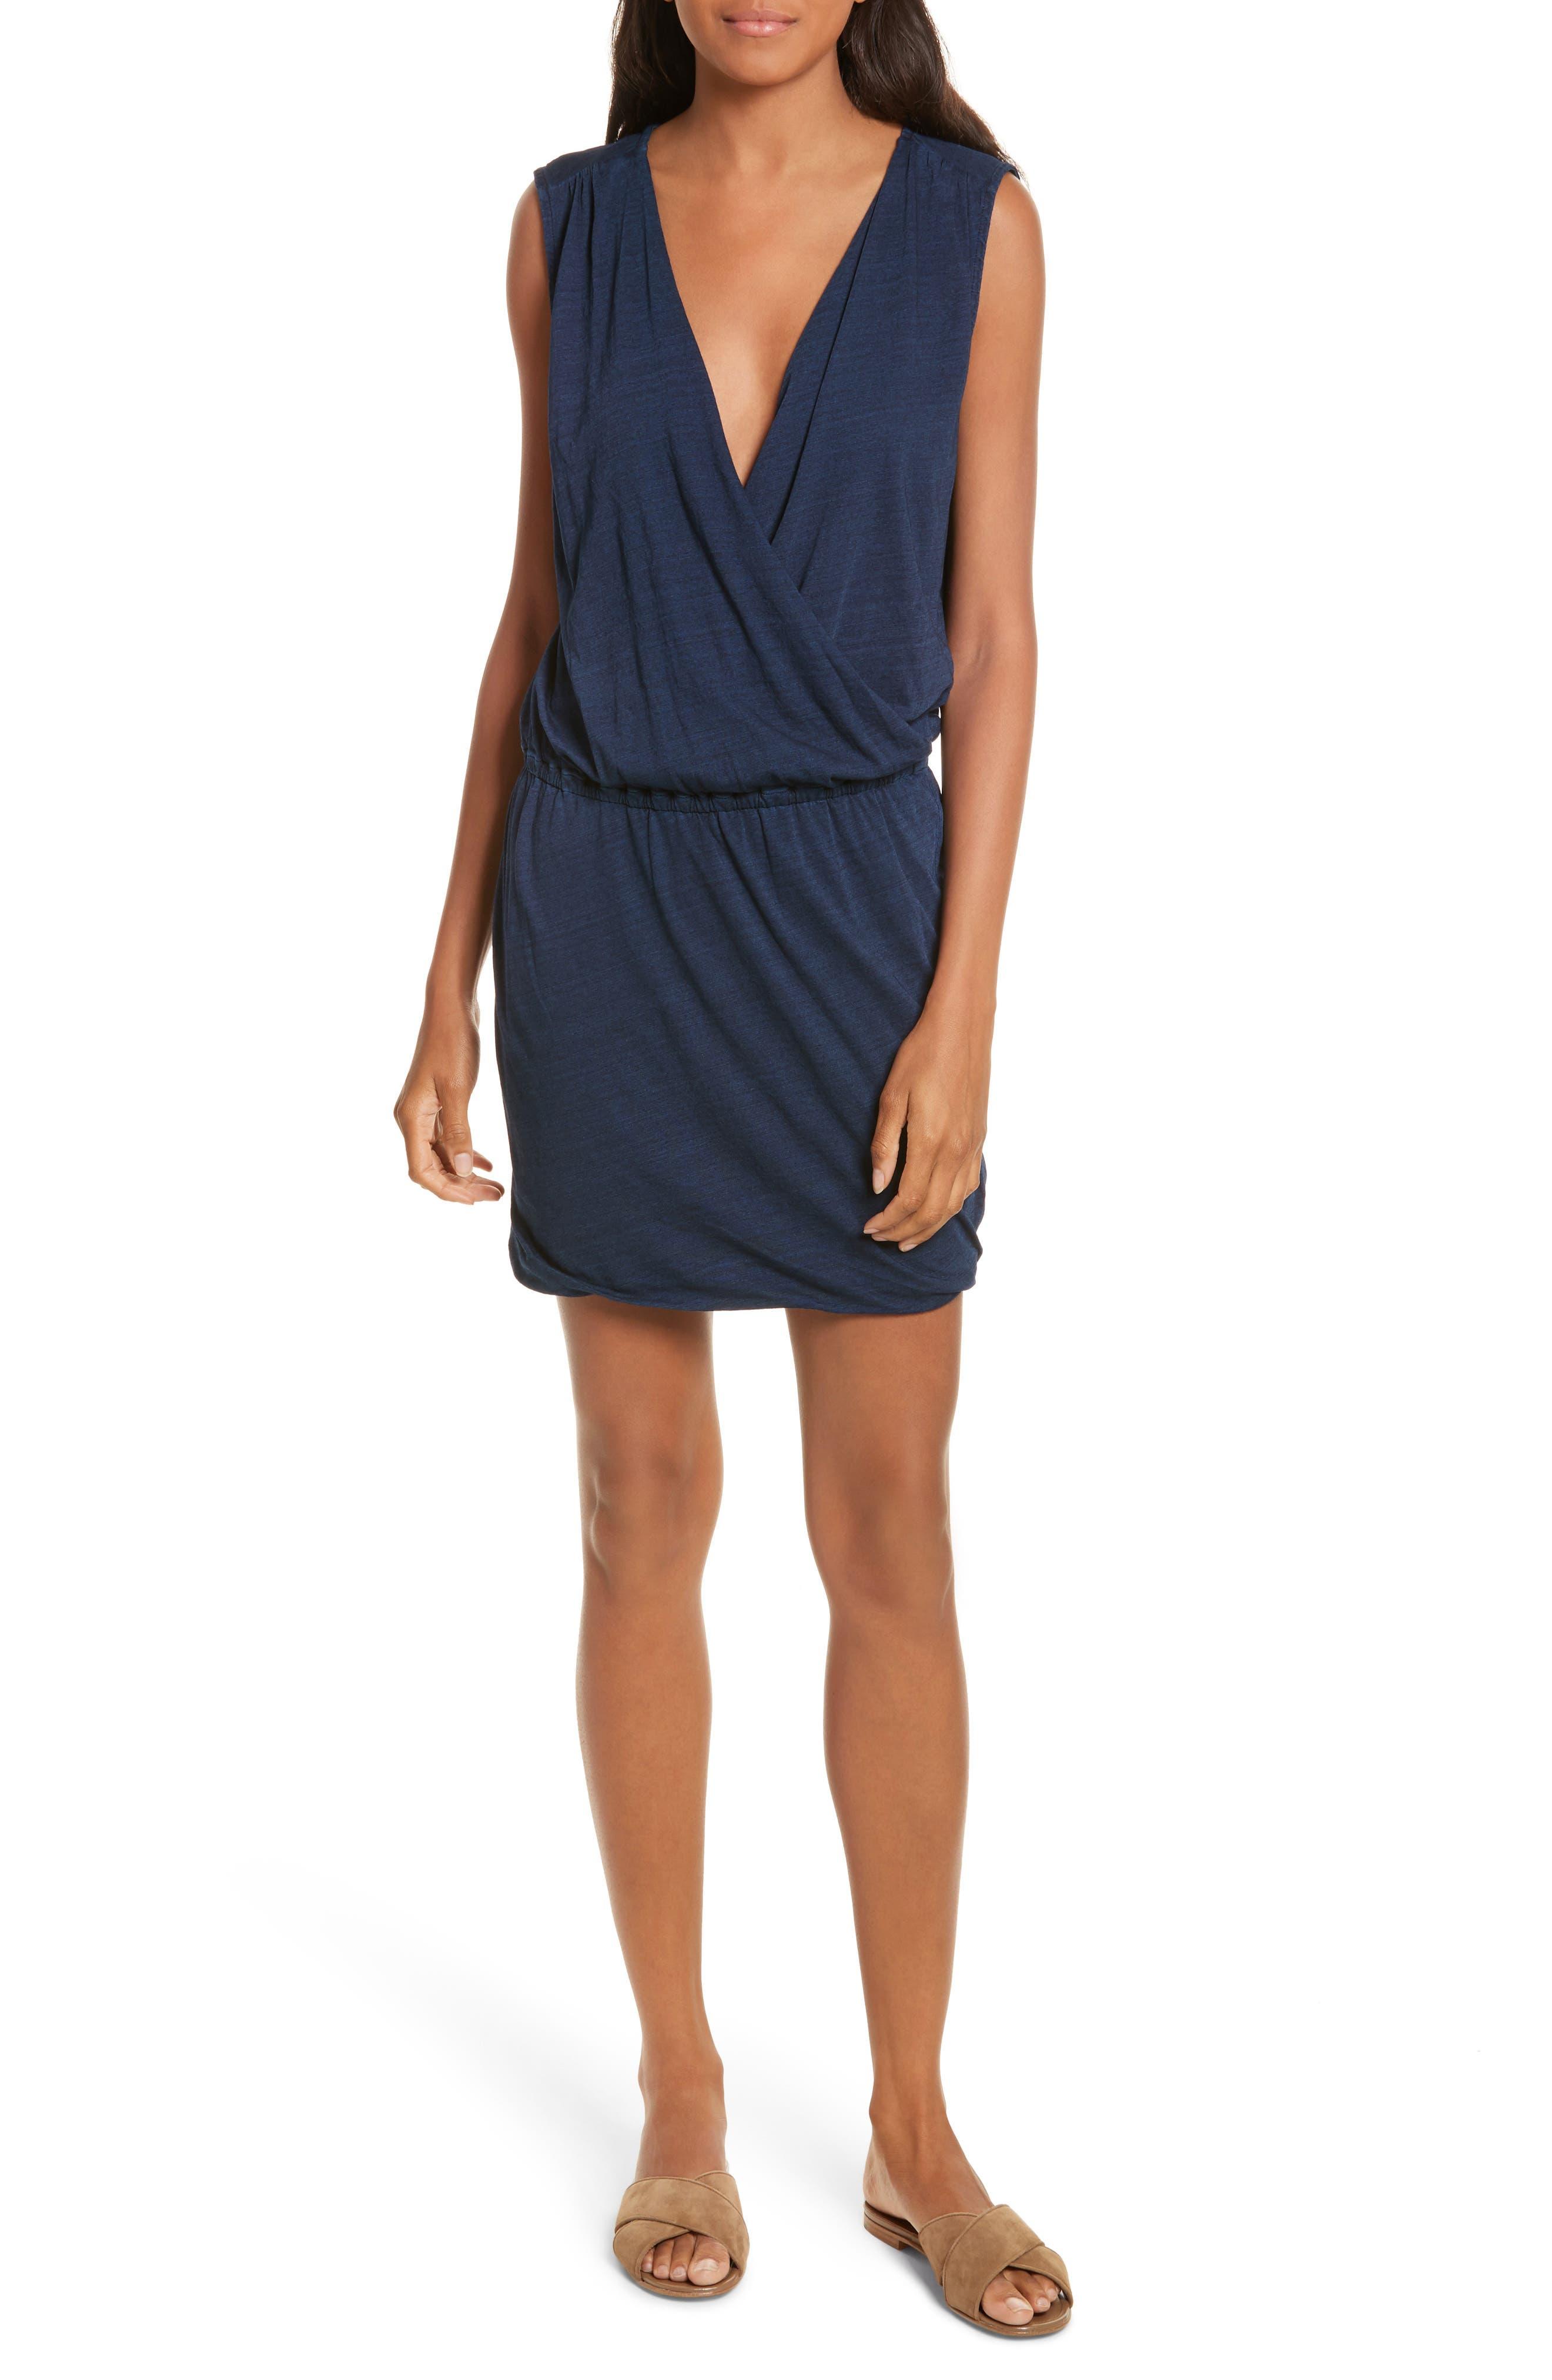 Alternate Image 1 Selected - Soft Joie Faylen Blouson Knit Dress